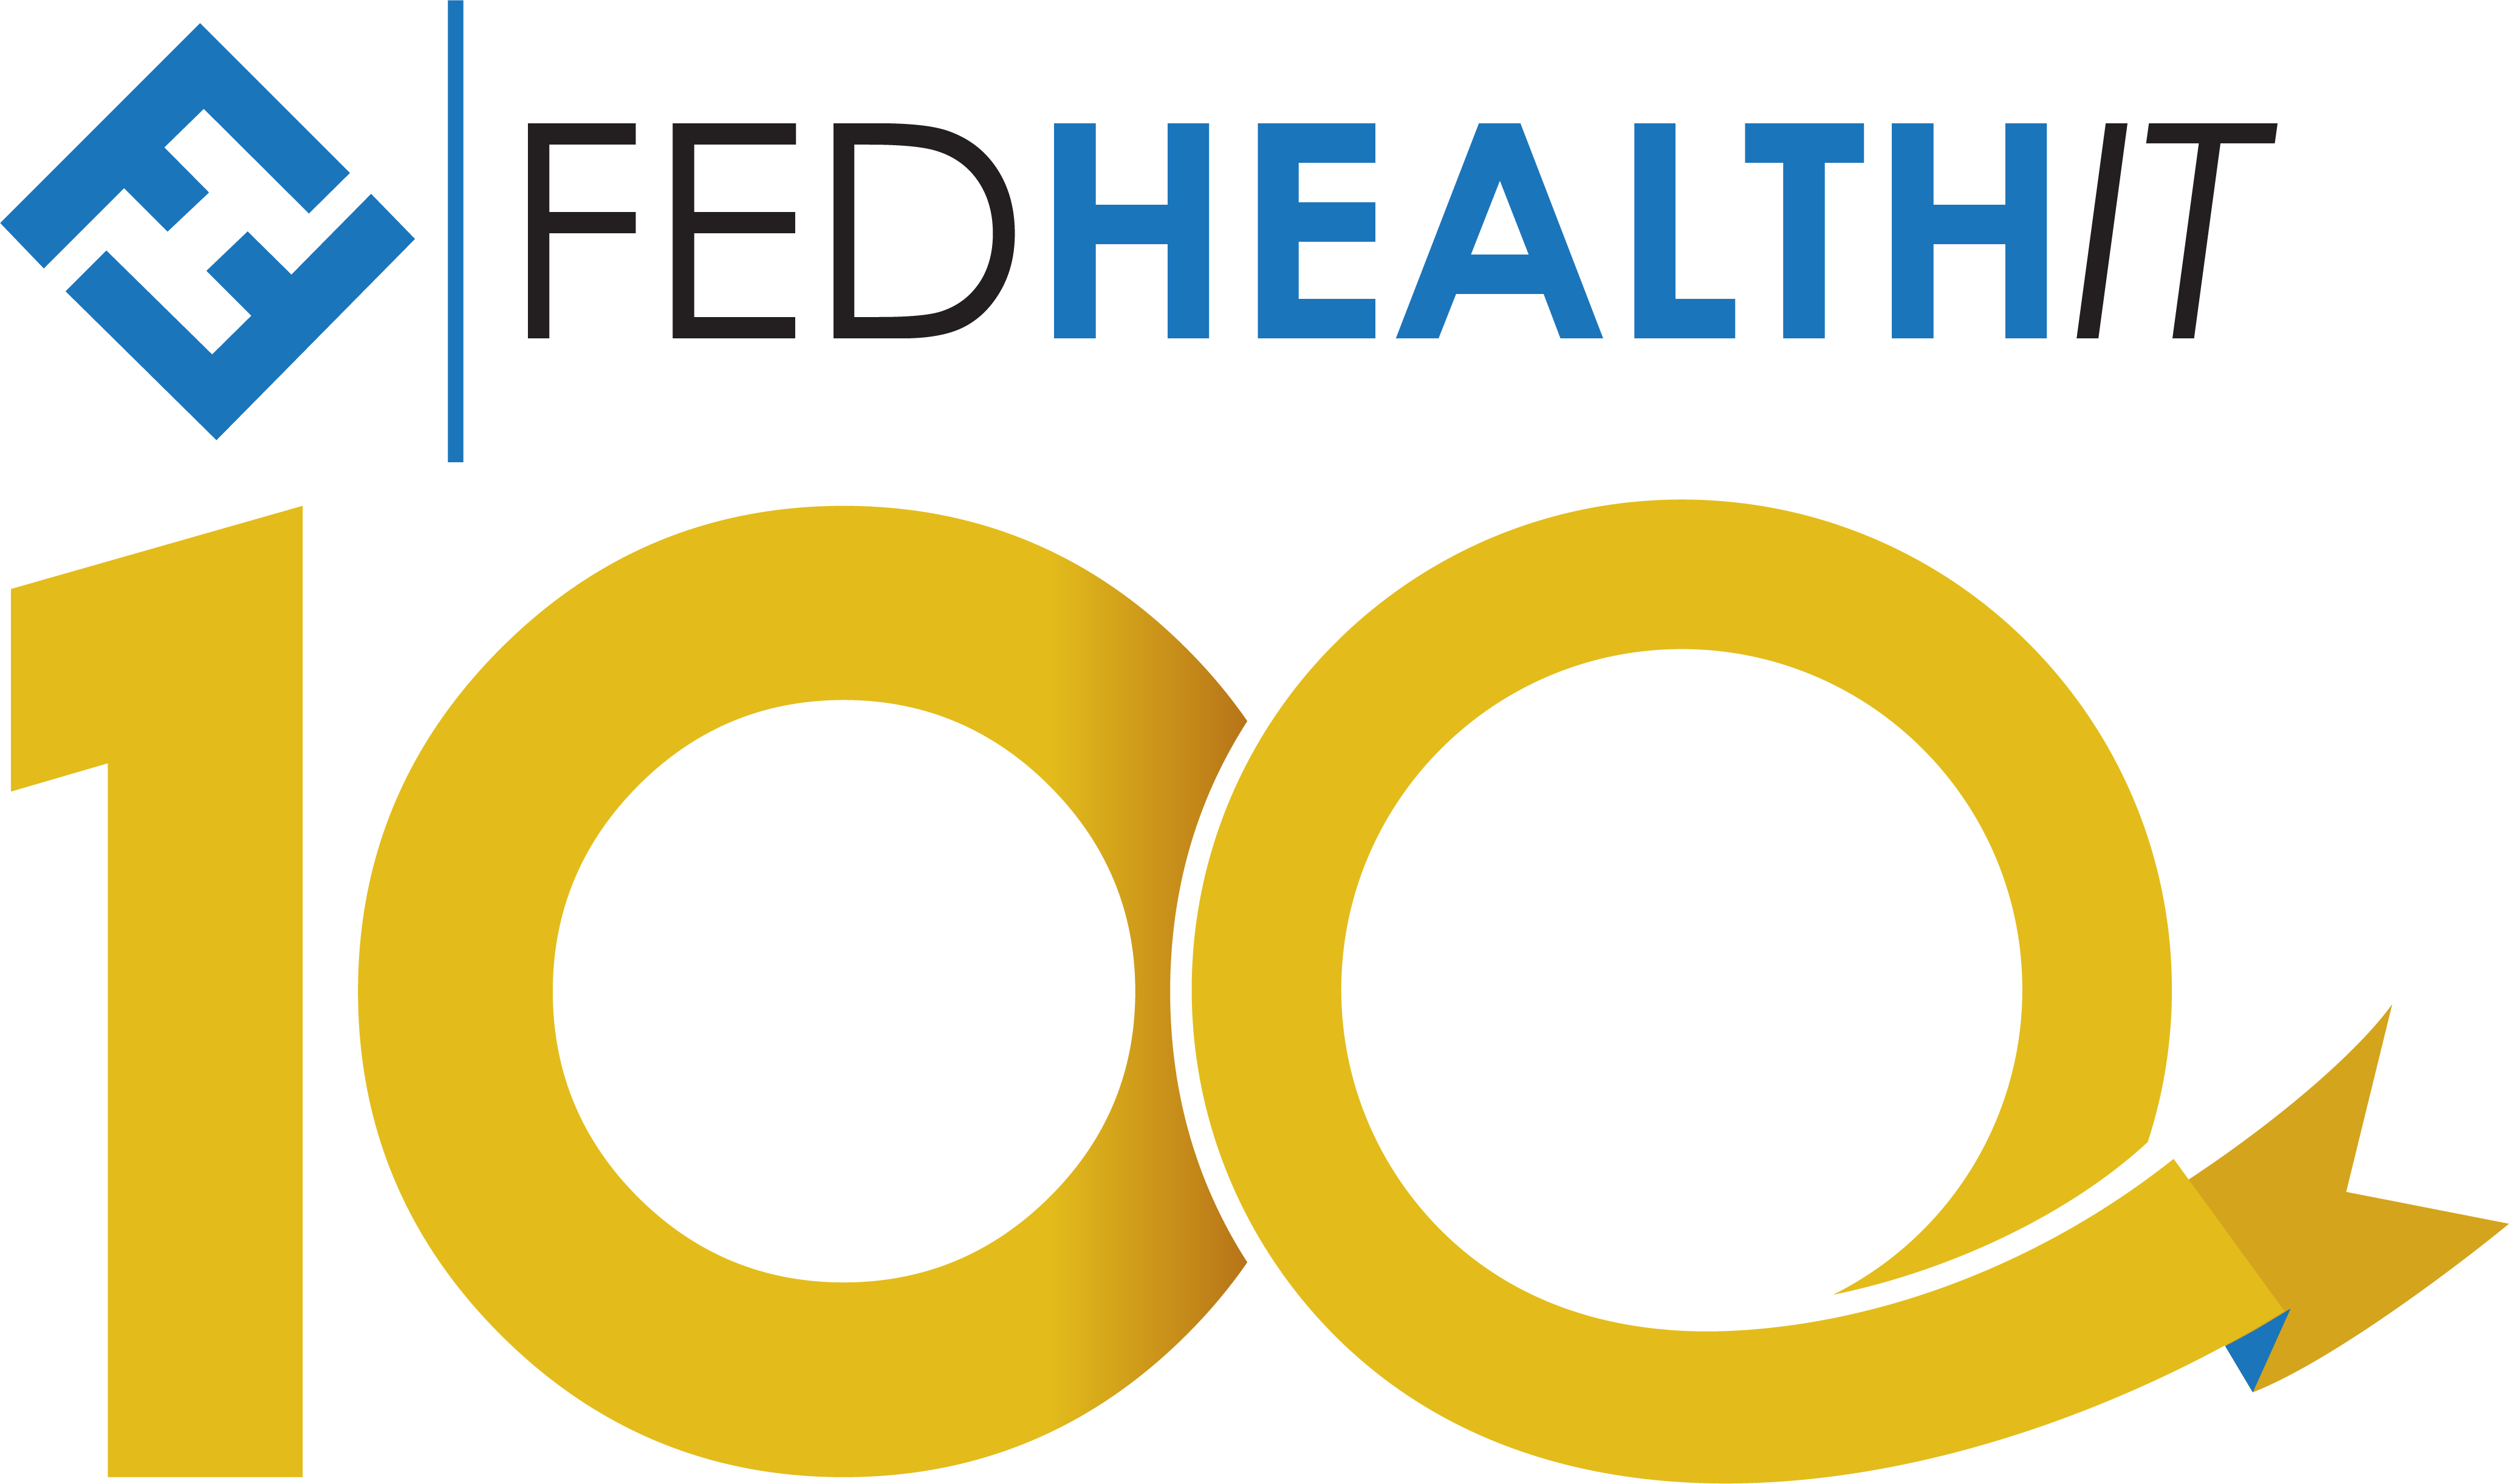 Scott is a 2021 FedHealth IT 100 Award Winner